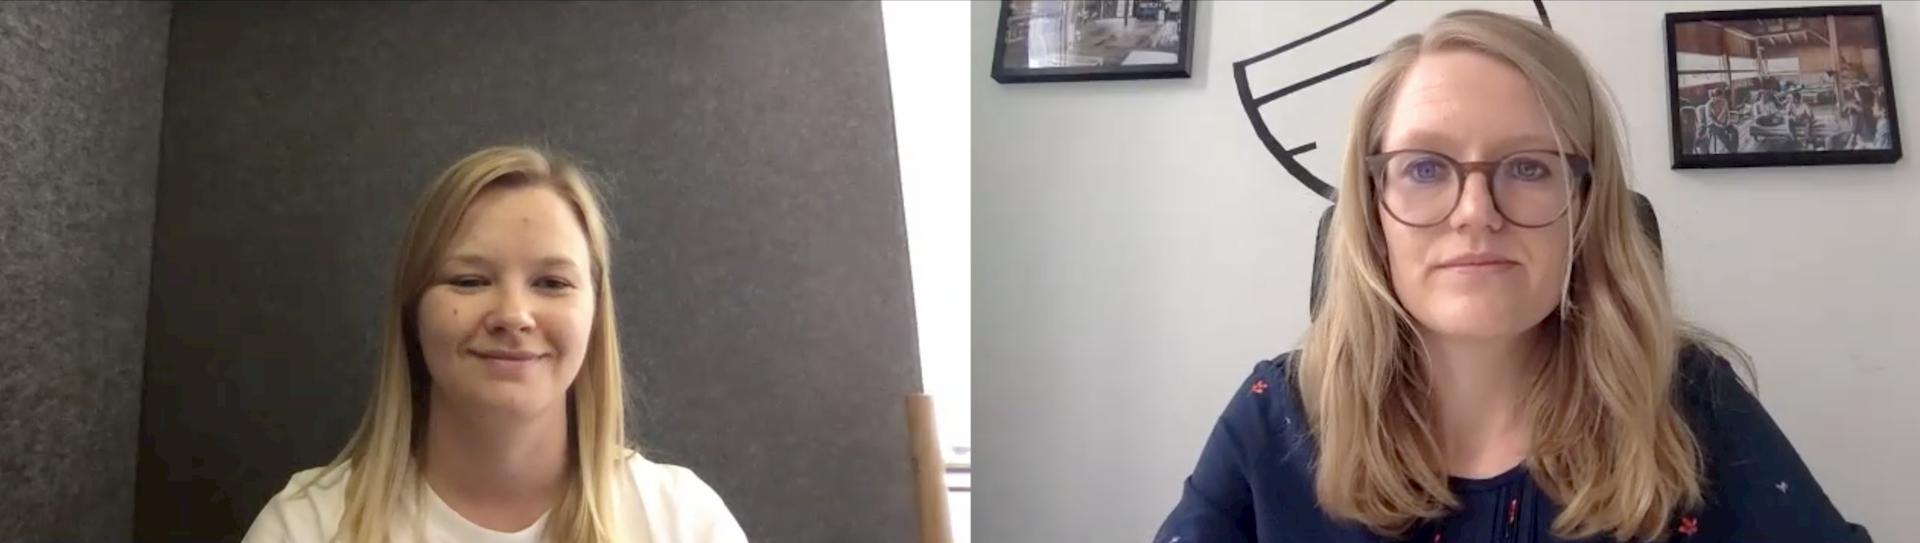 Berg-Macher-Starke-Teams-Kommunikation-Interview-2